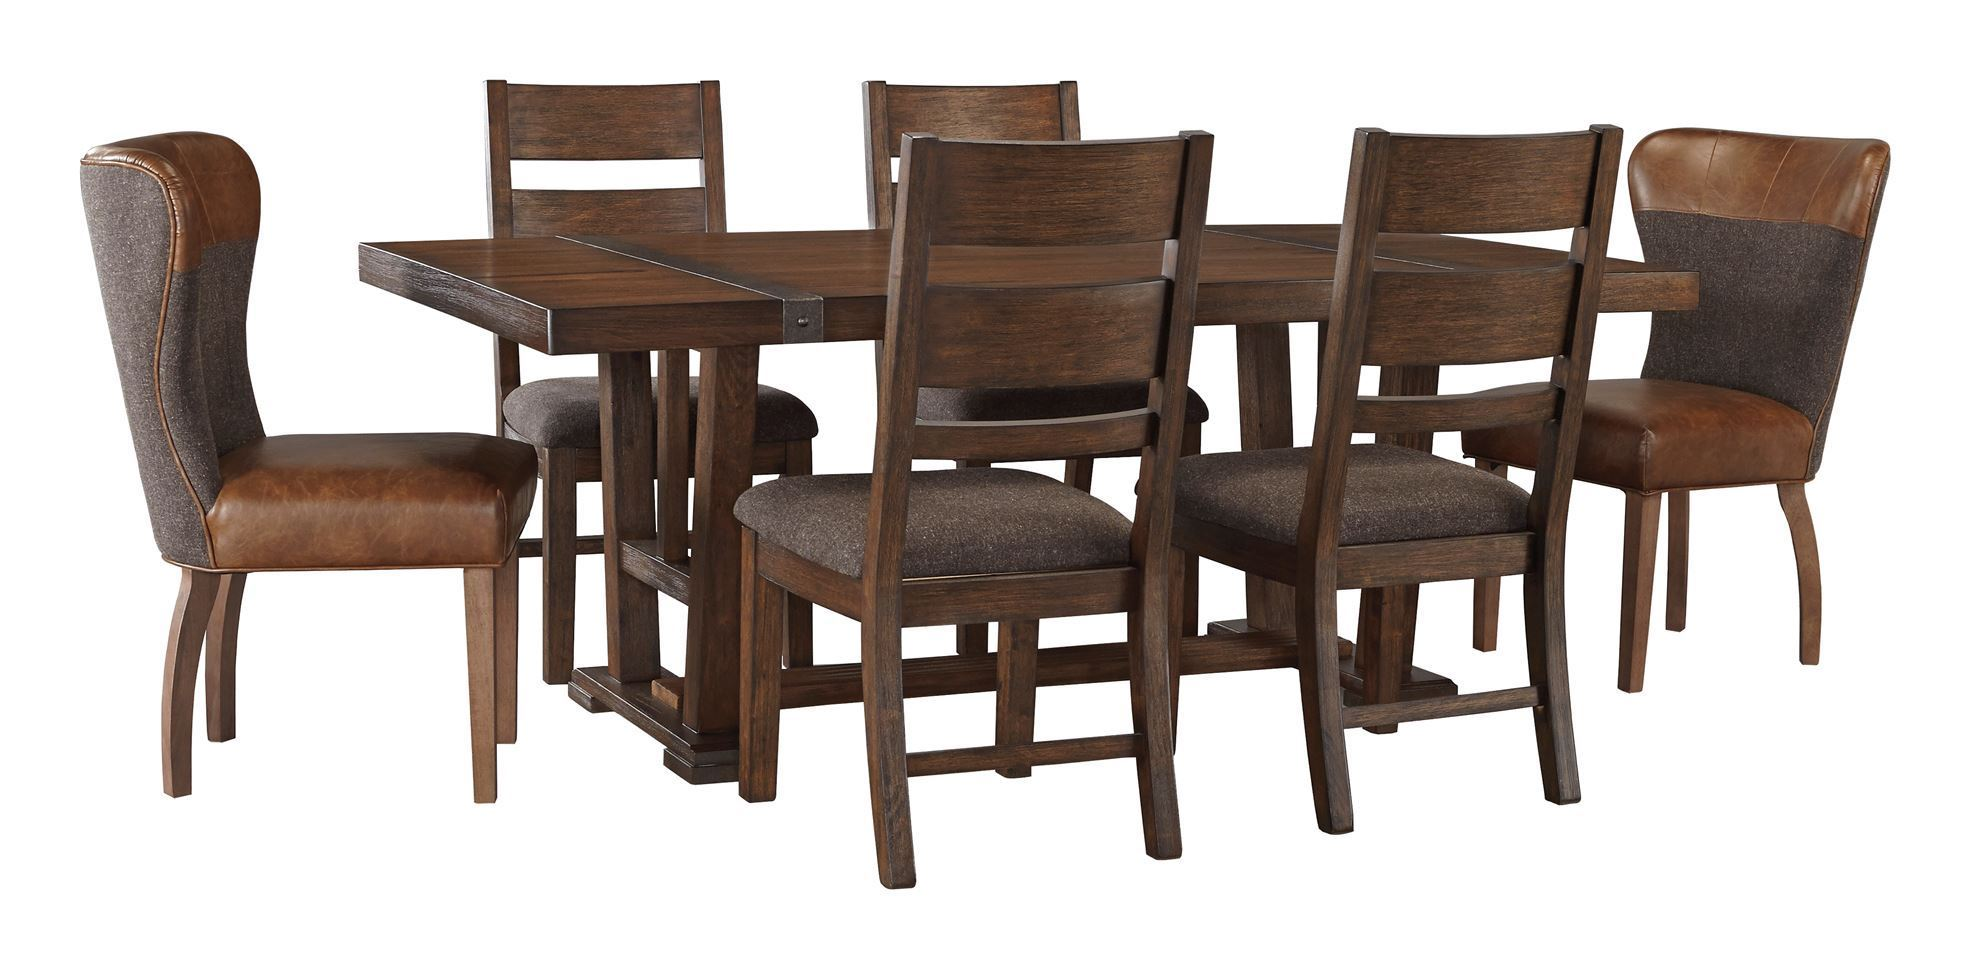 Hauslife Furniture E Store Biggest Furniture Online Store In Malaysia Malaysia Furniture Zenfield Rectangular Dining Room Table